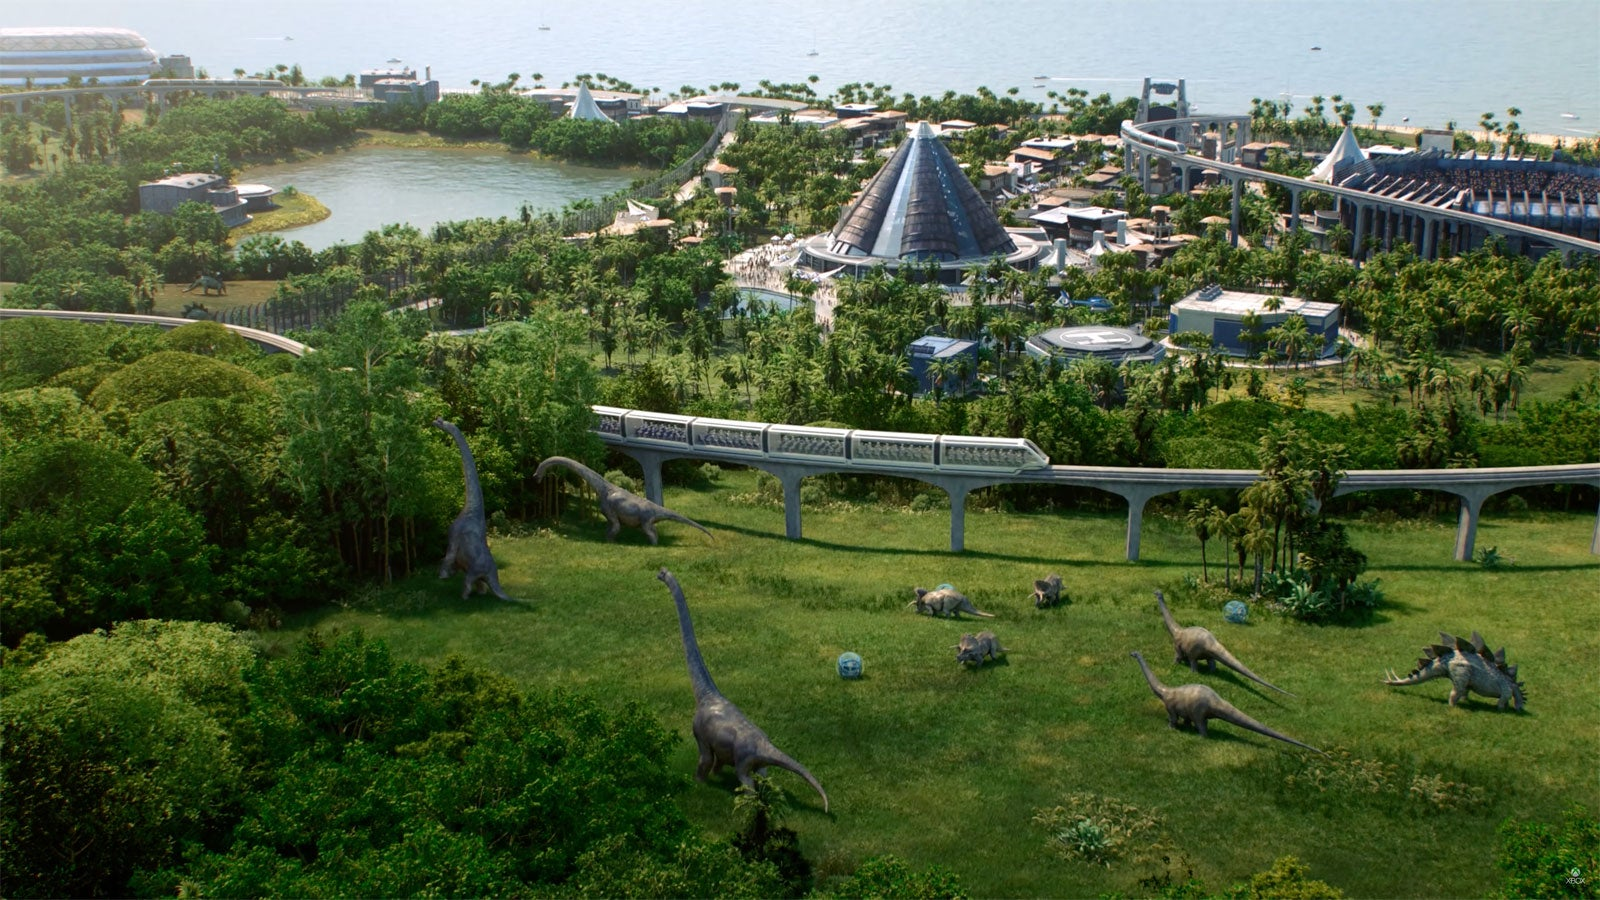 「Jurassic World Evolution」的圖片搜尋結果